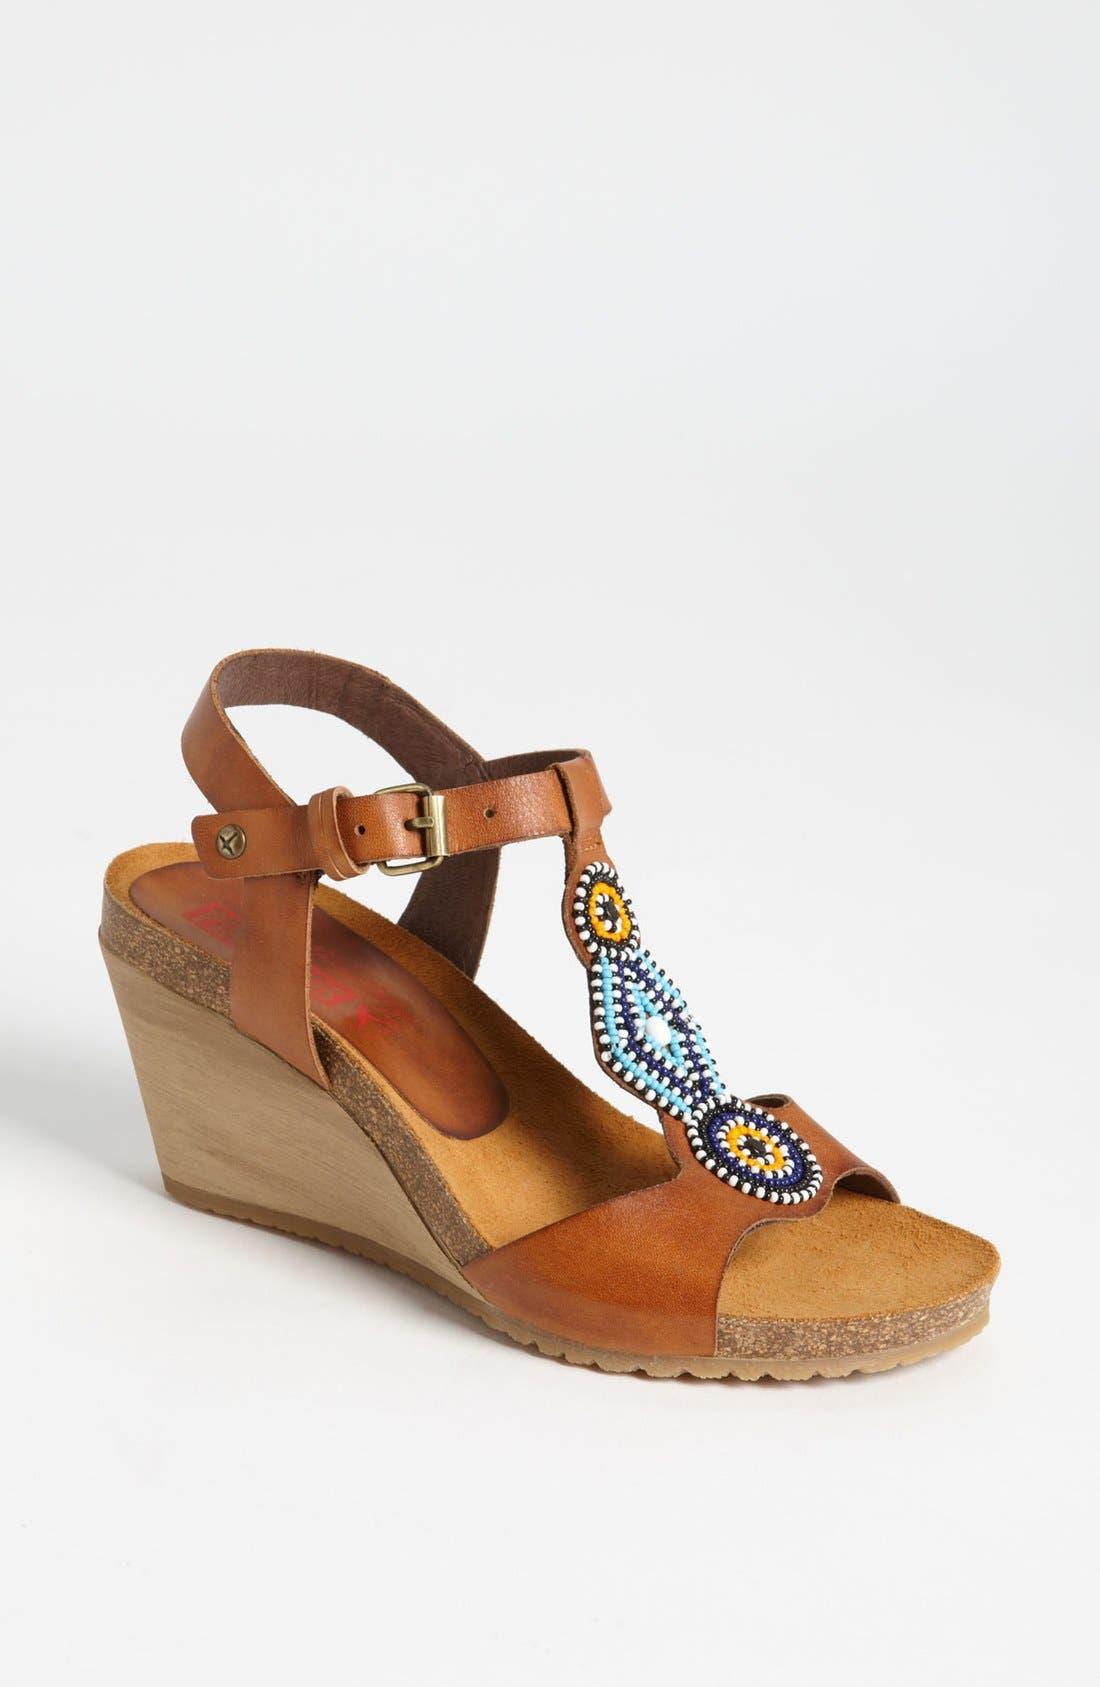 Main Image - PIKOLINOS 'Benissa Maasai 1' Sandal